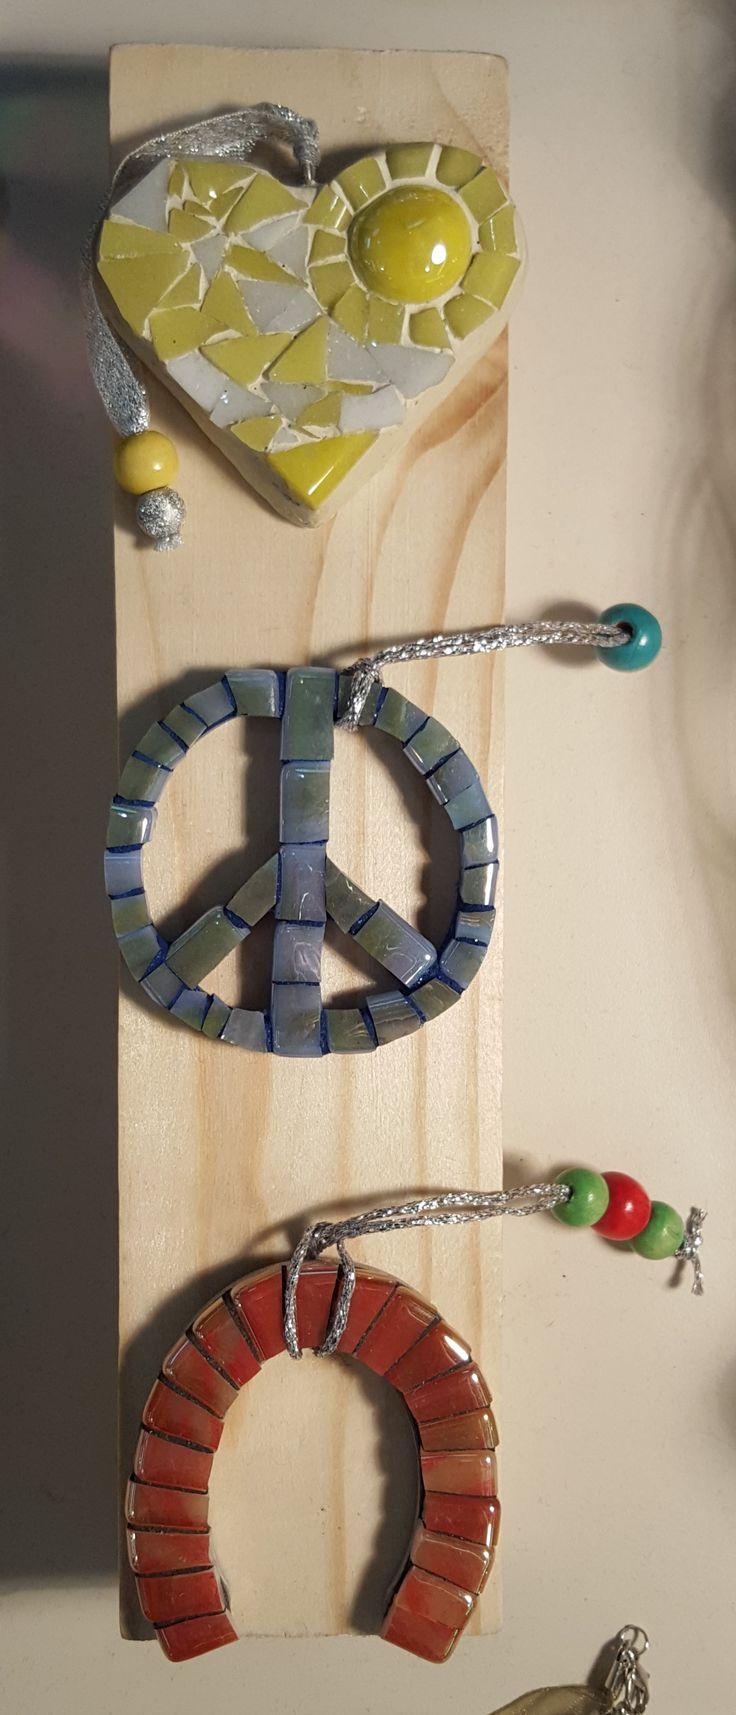 Decoration - mosaic glass